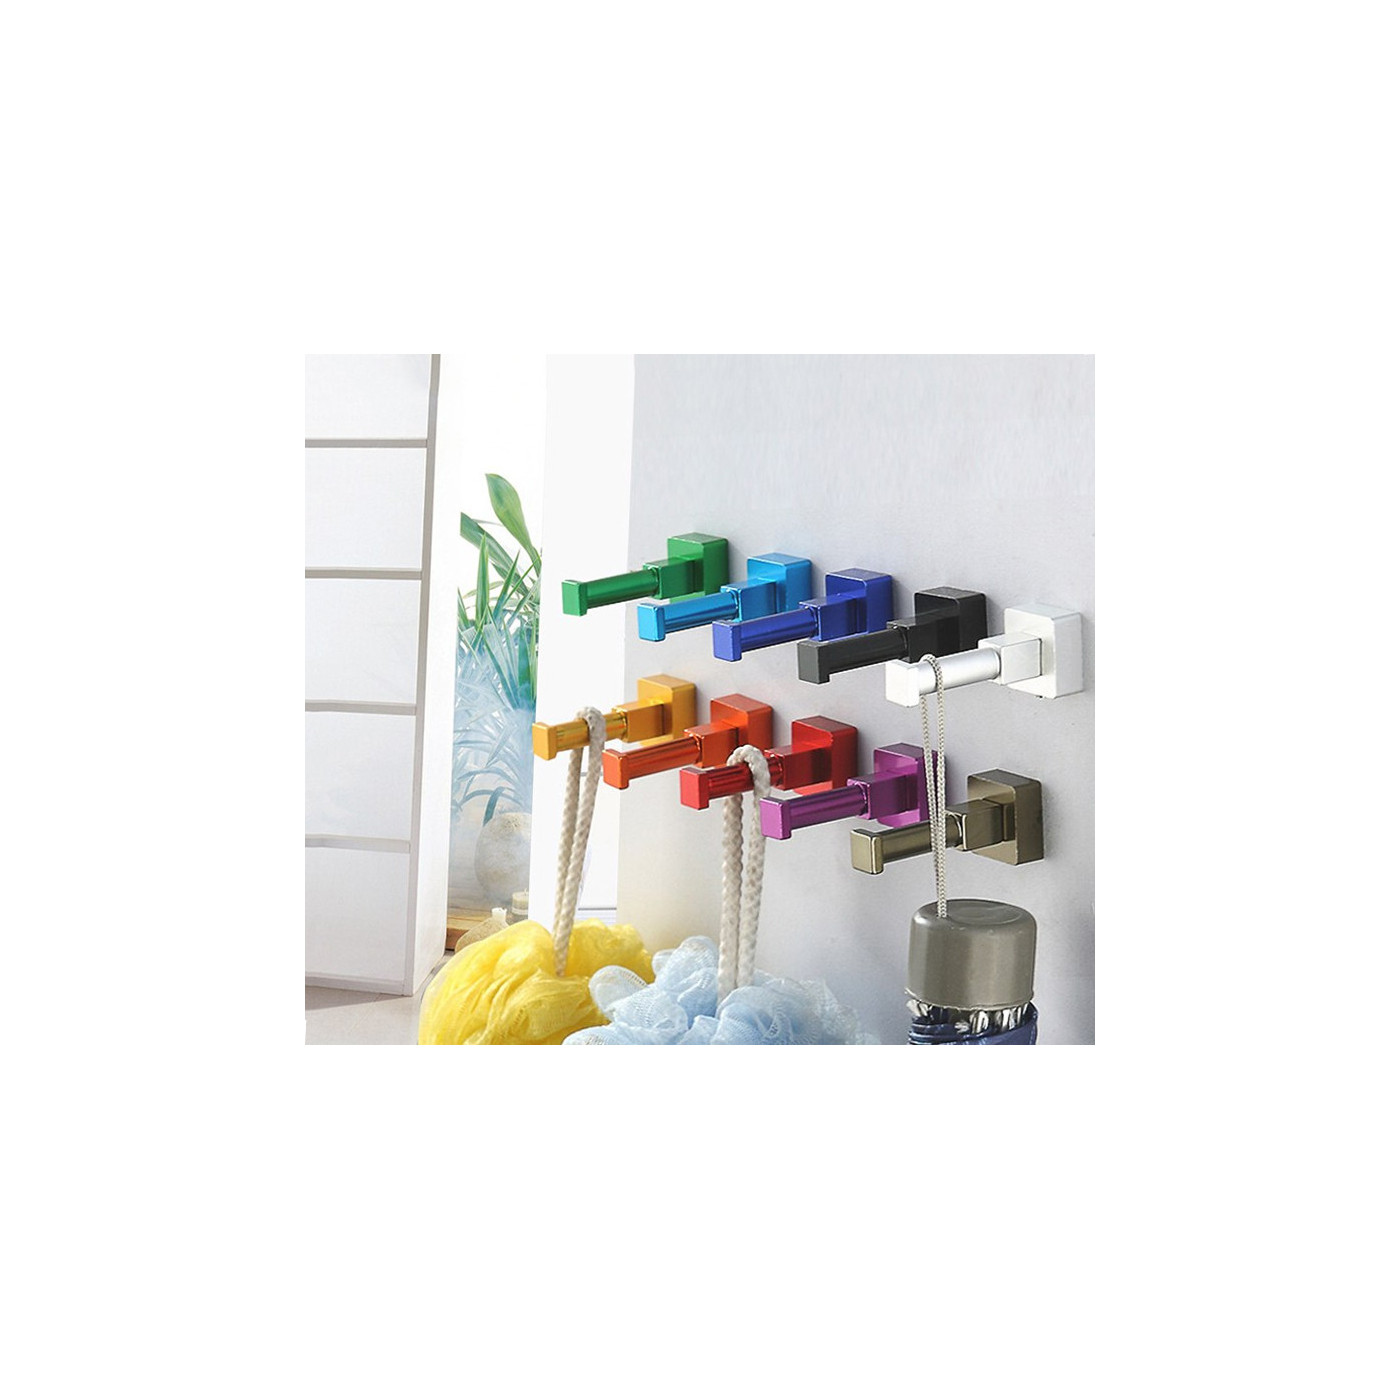 Set of 10 colorful clothes hooks (aluminum, square, bronze)